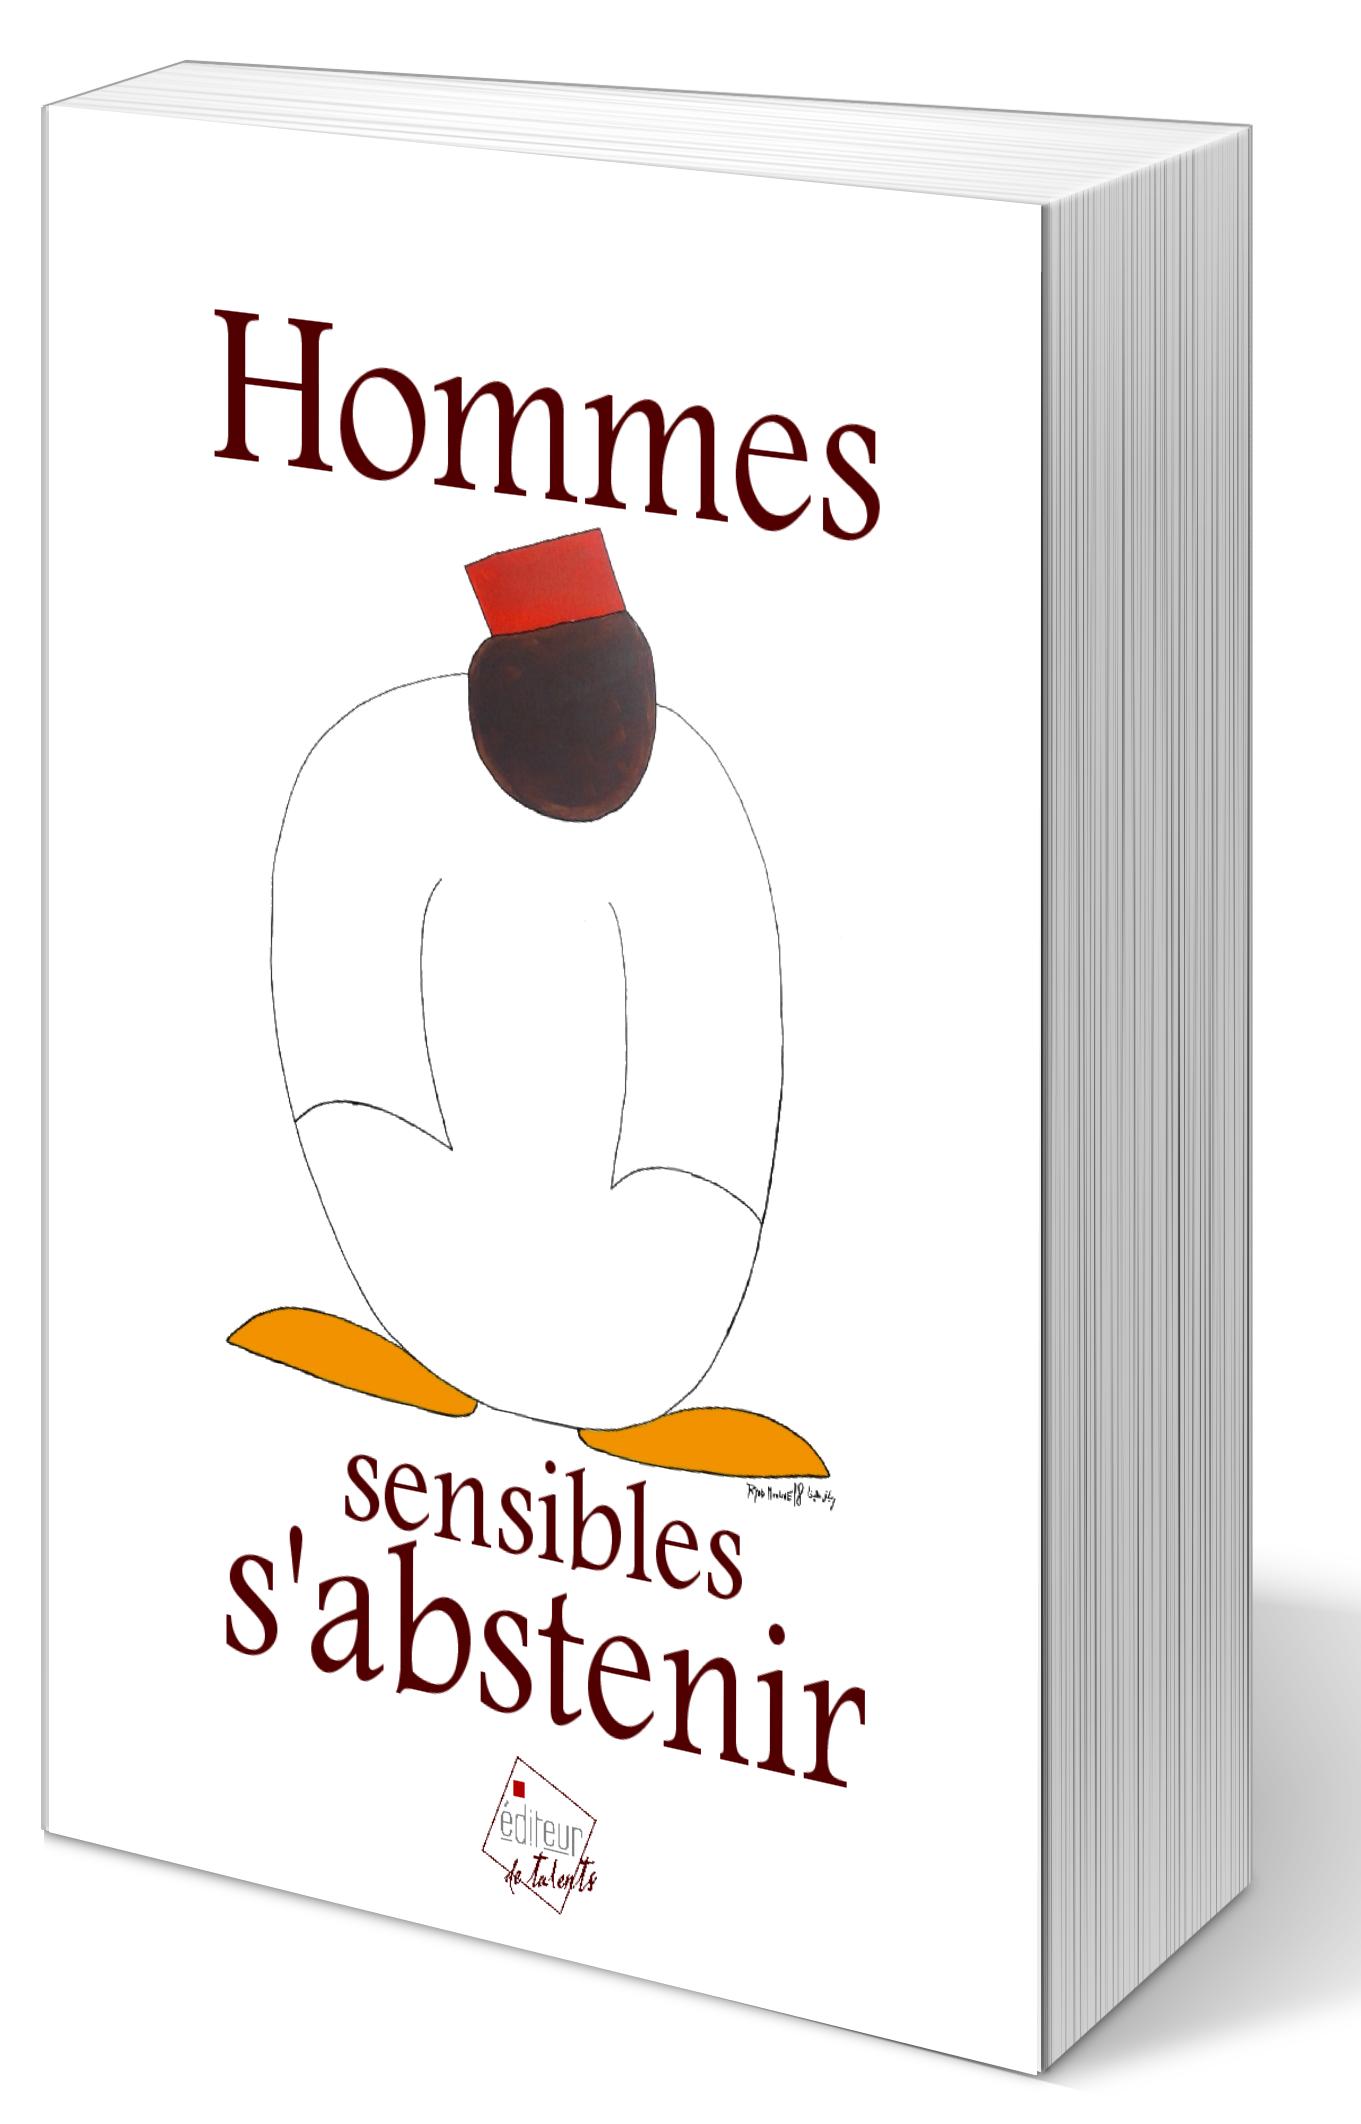 Hommes sensibles s'abstenir